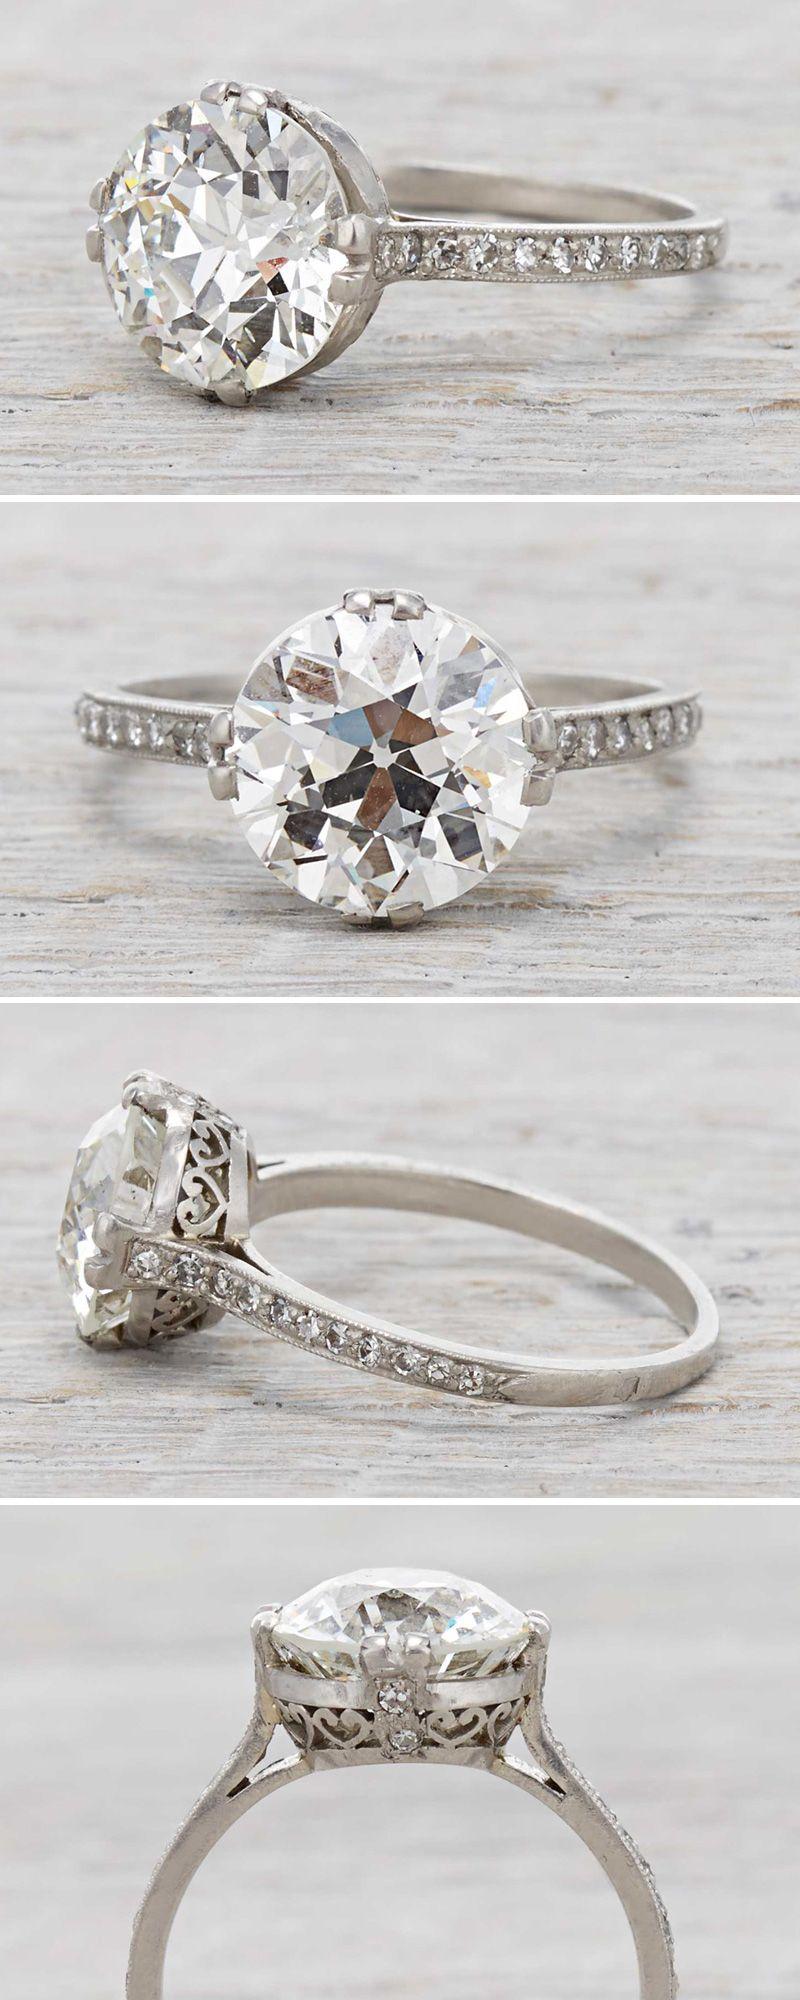 Art deco vintage engagement ring with a carat diamond circa